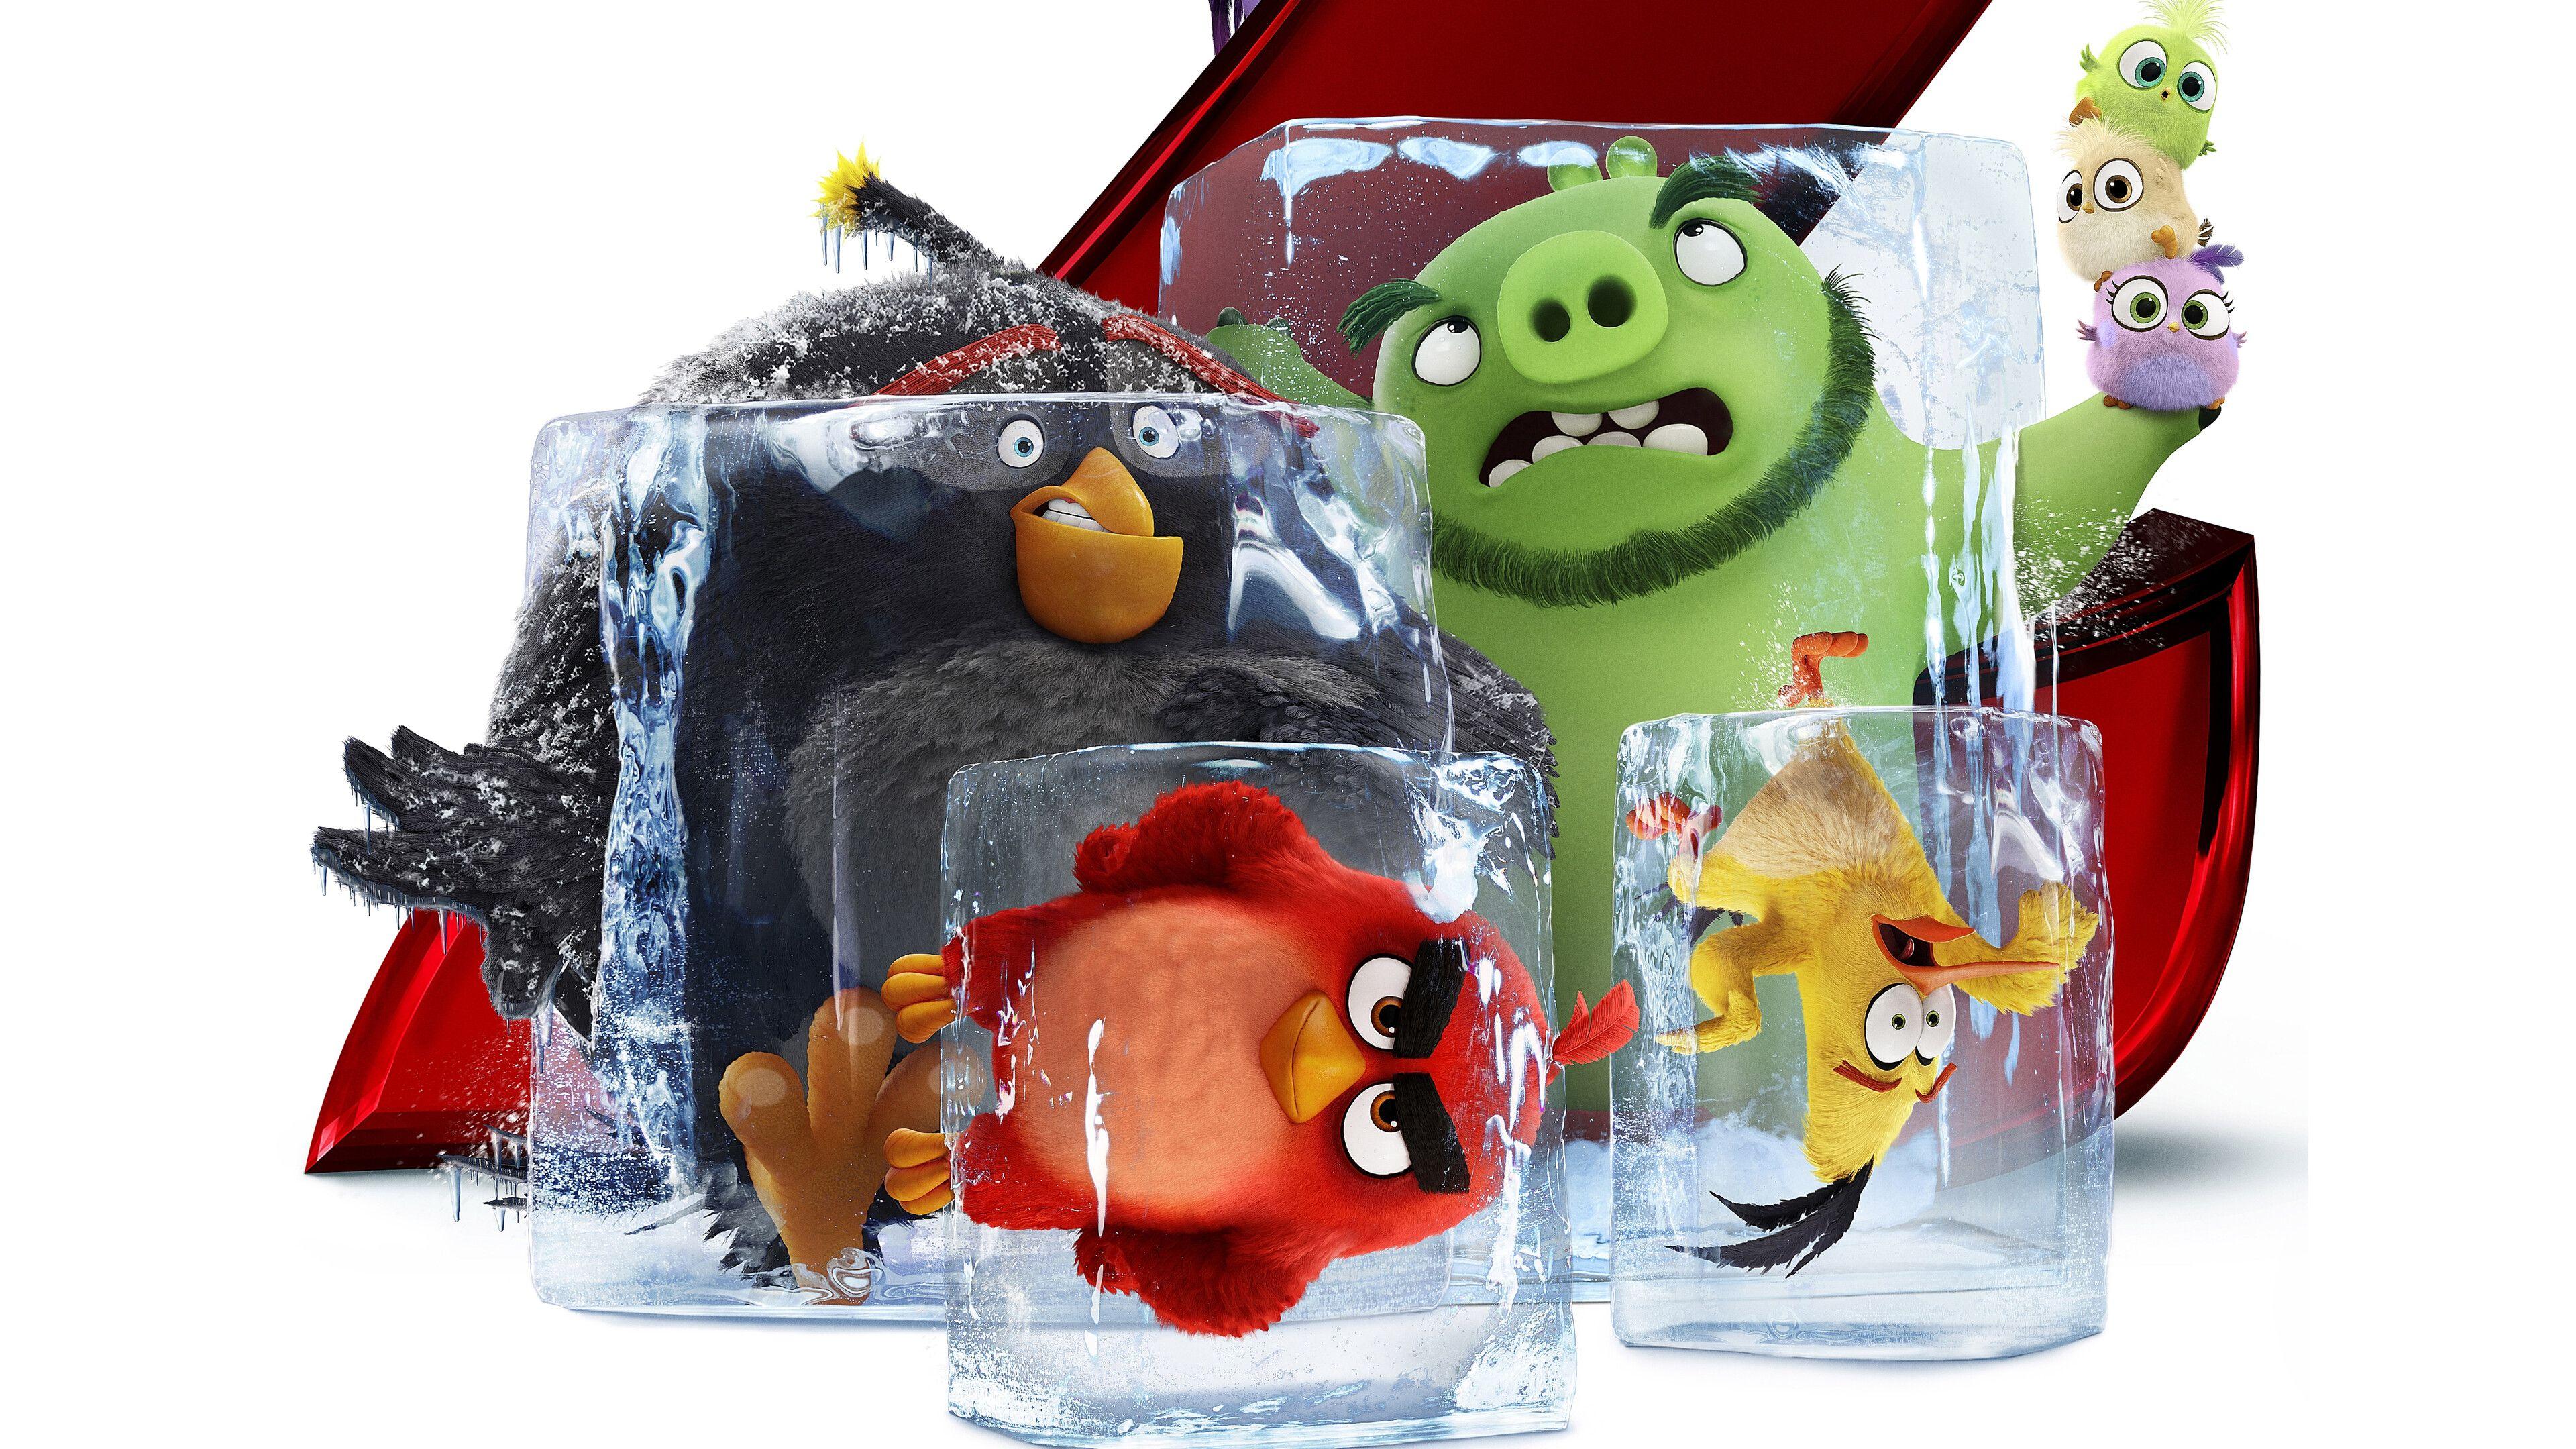 Angry Birds Movie 2 Bomb Red Chuck Leonard 8k Wallpaper 12 Angry Birds Movie Angry Birds 8k Wallpaper